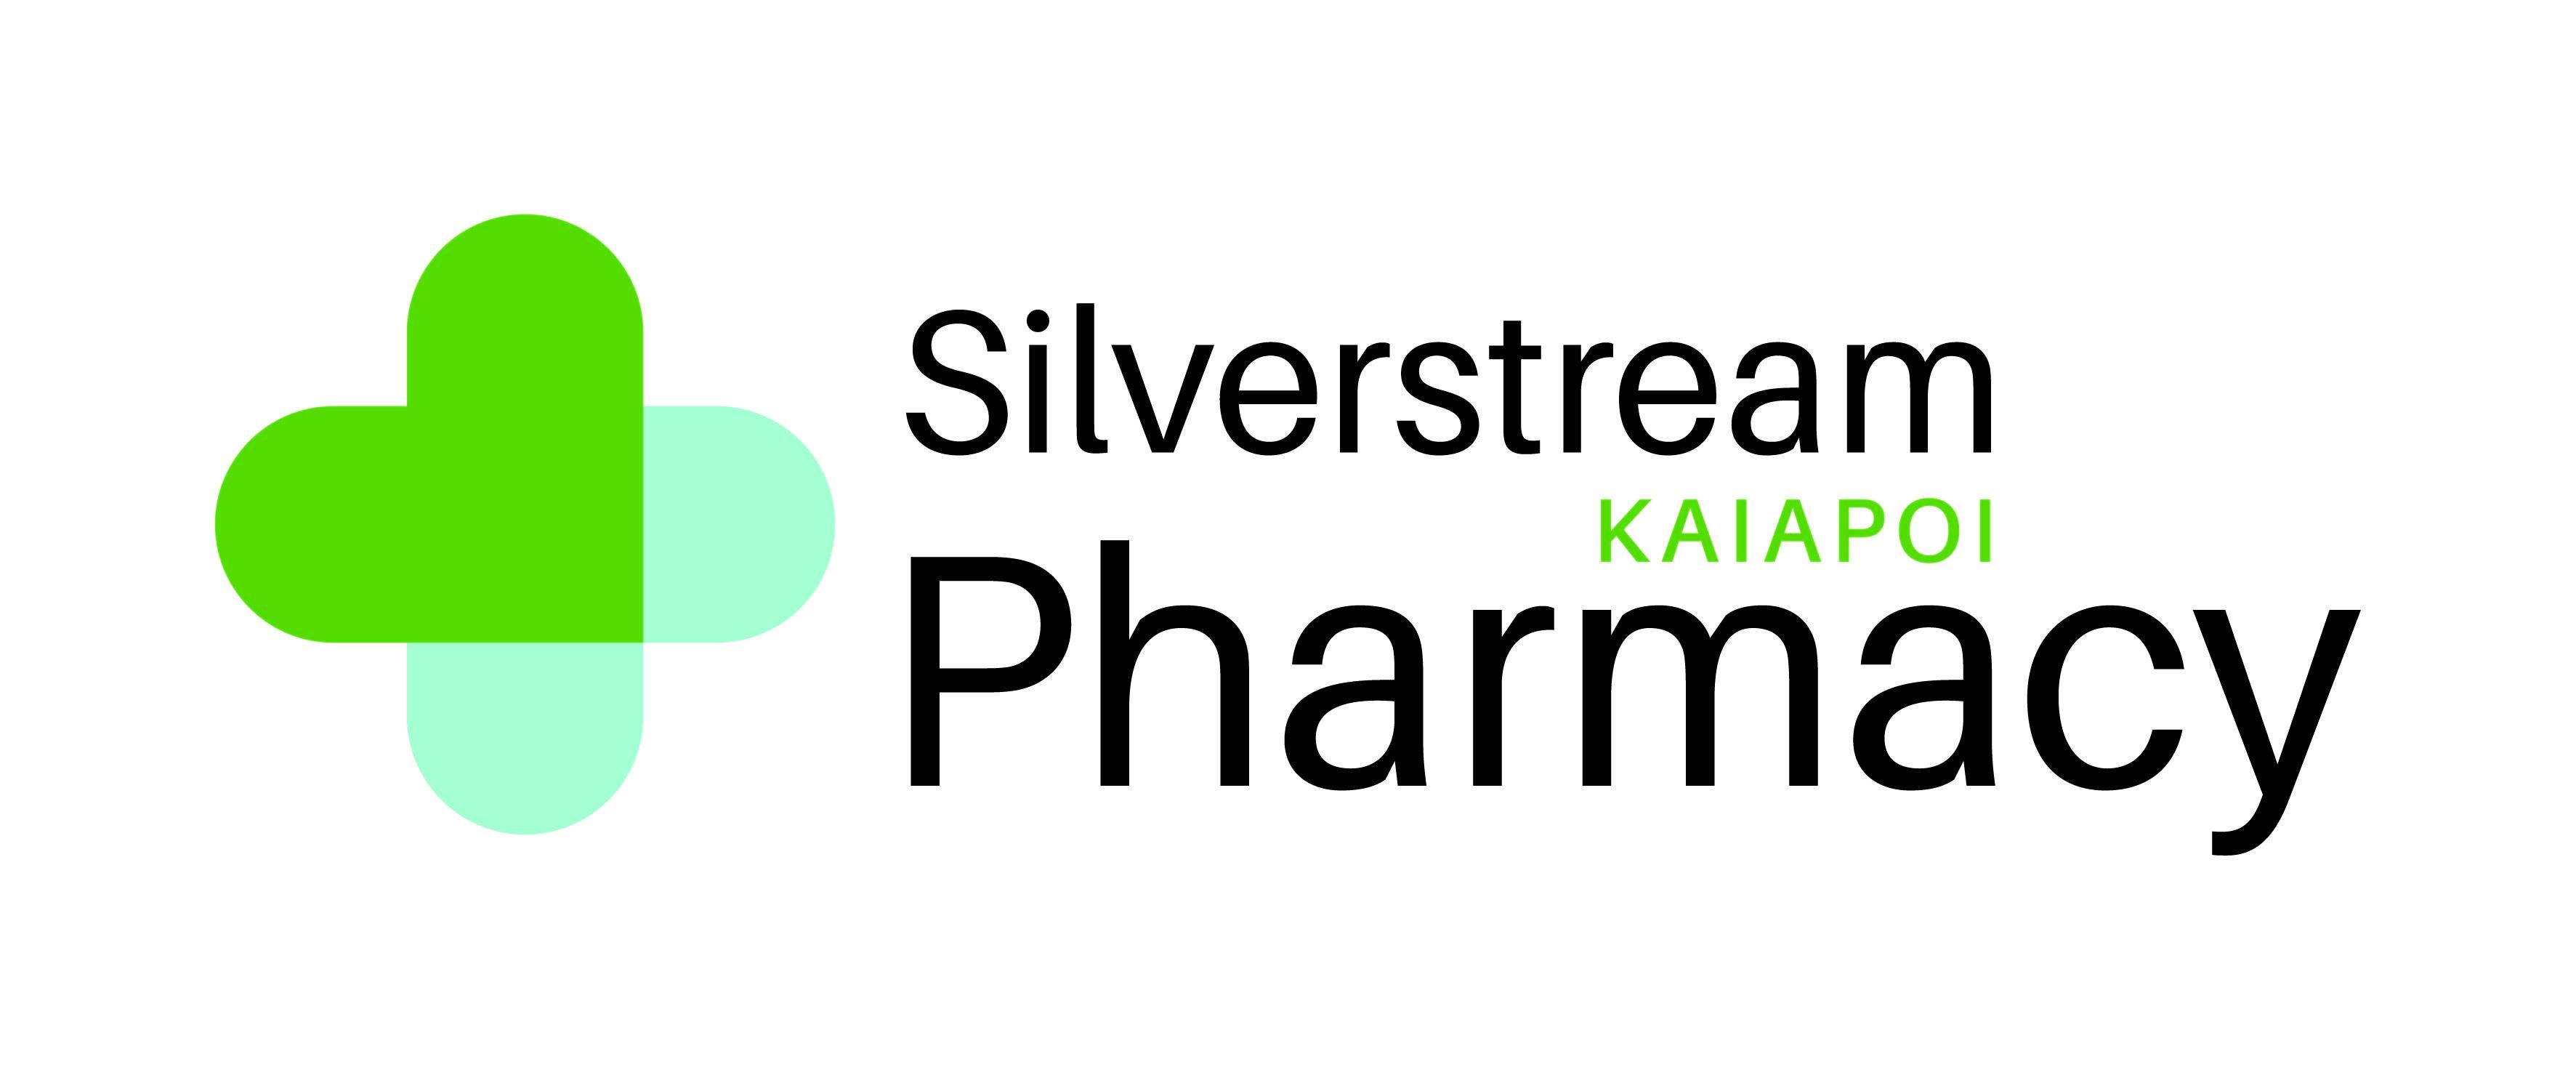 Silverstream Pharmacy